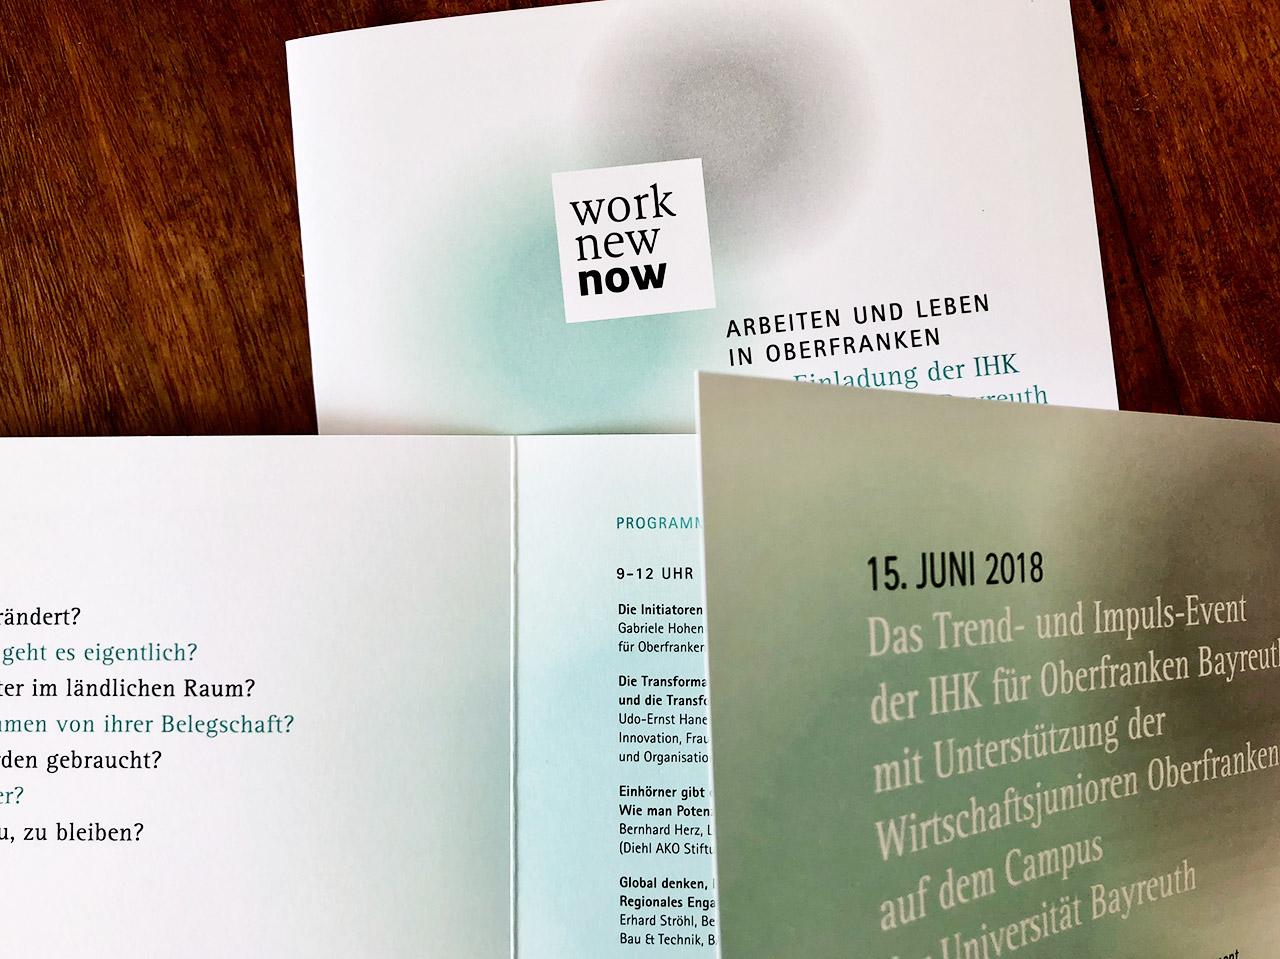 IHK WorkNewNow Druck logo that carries future